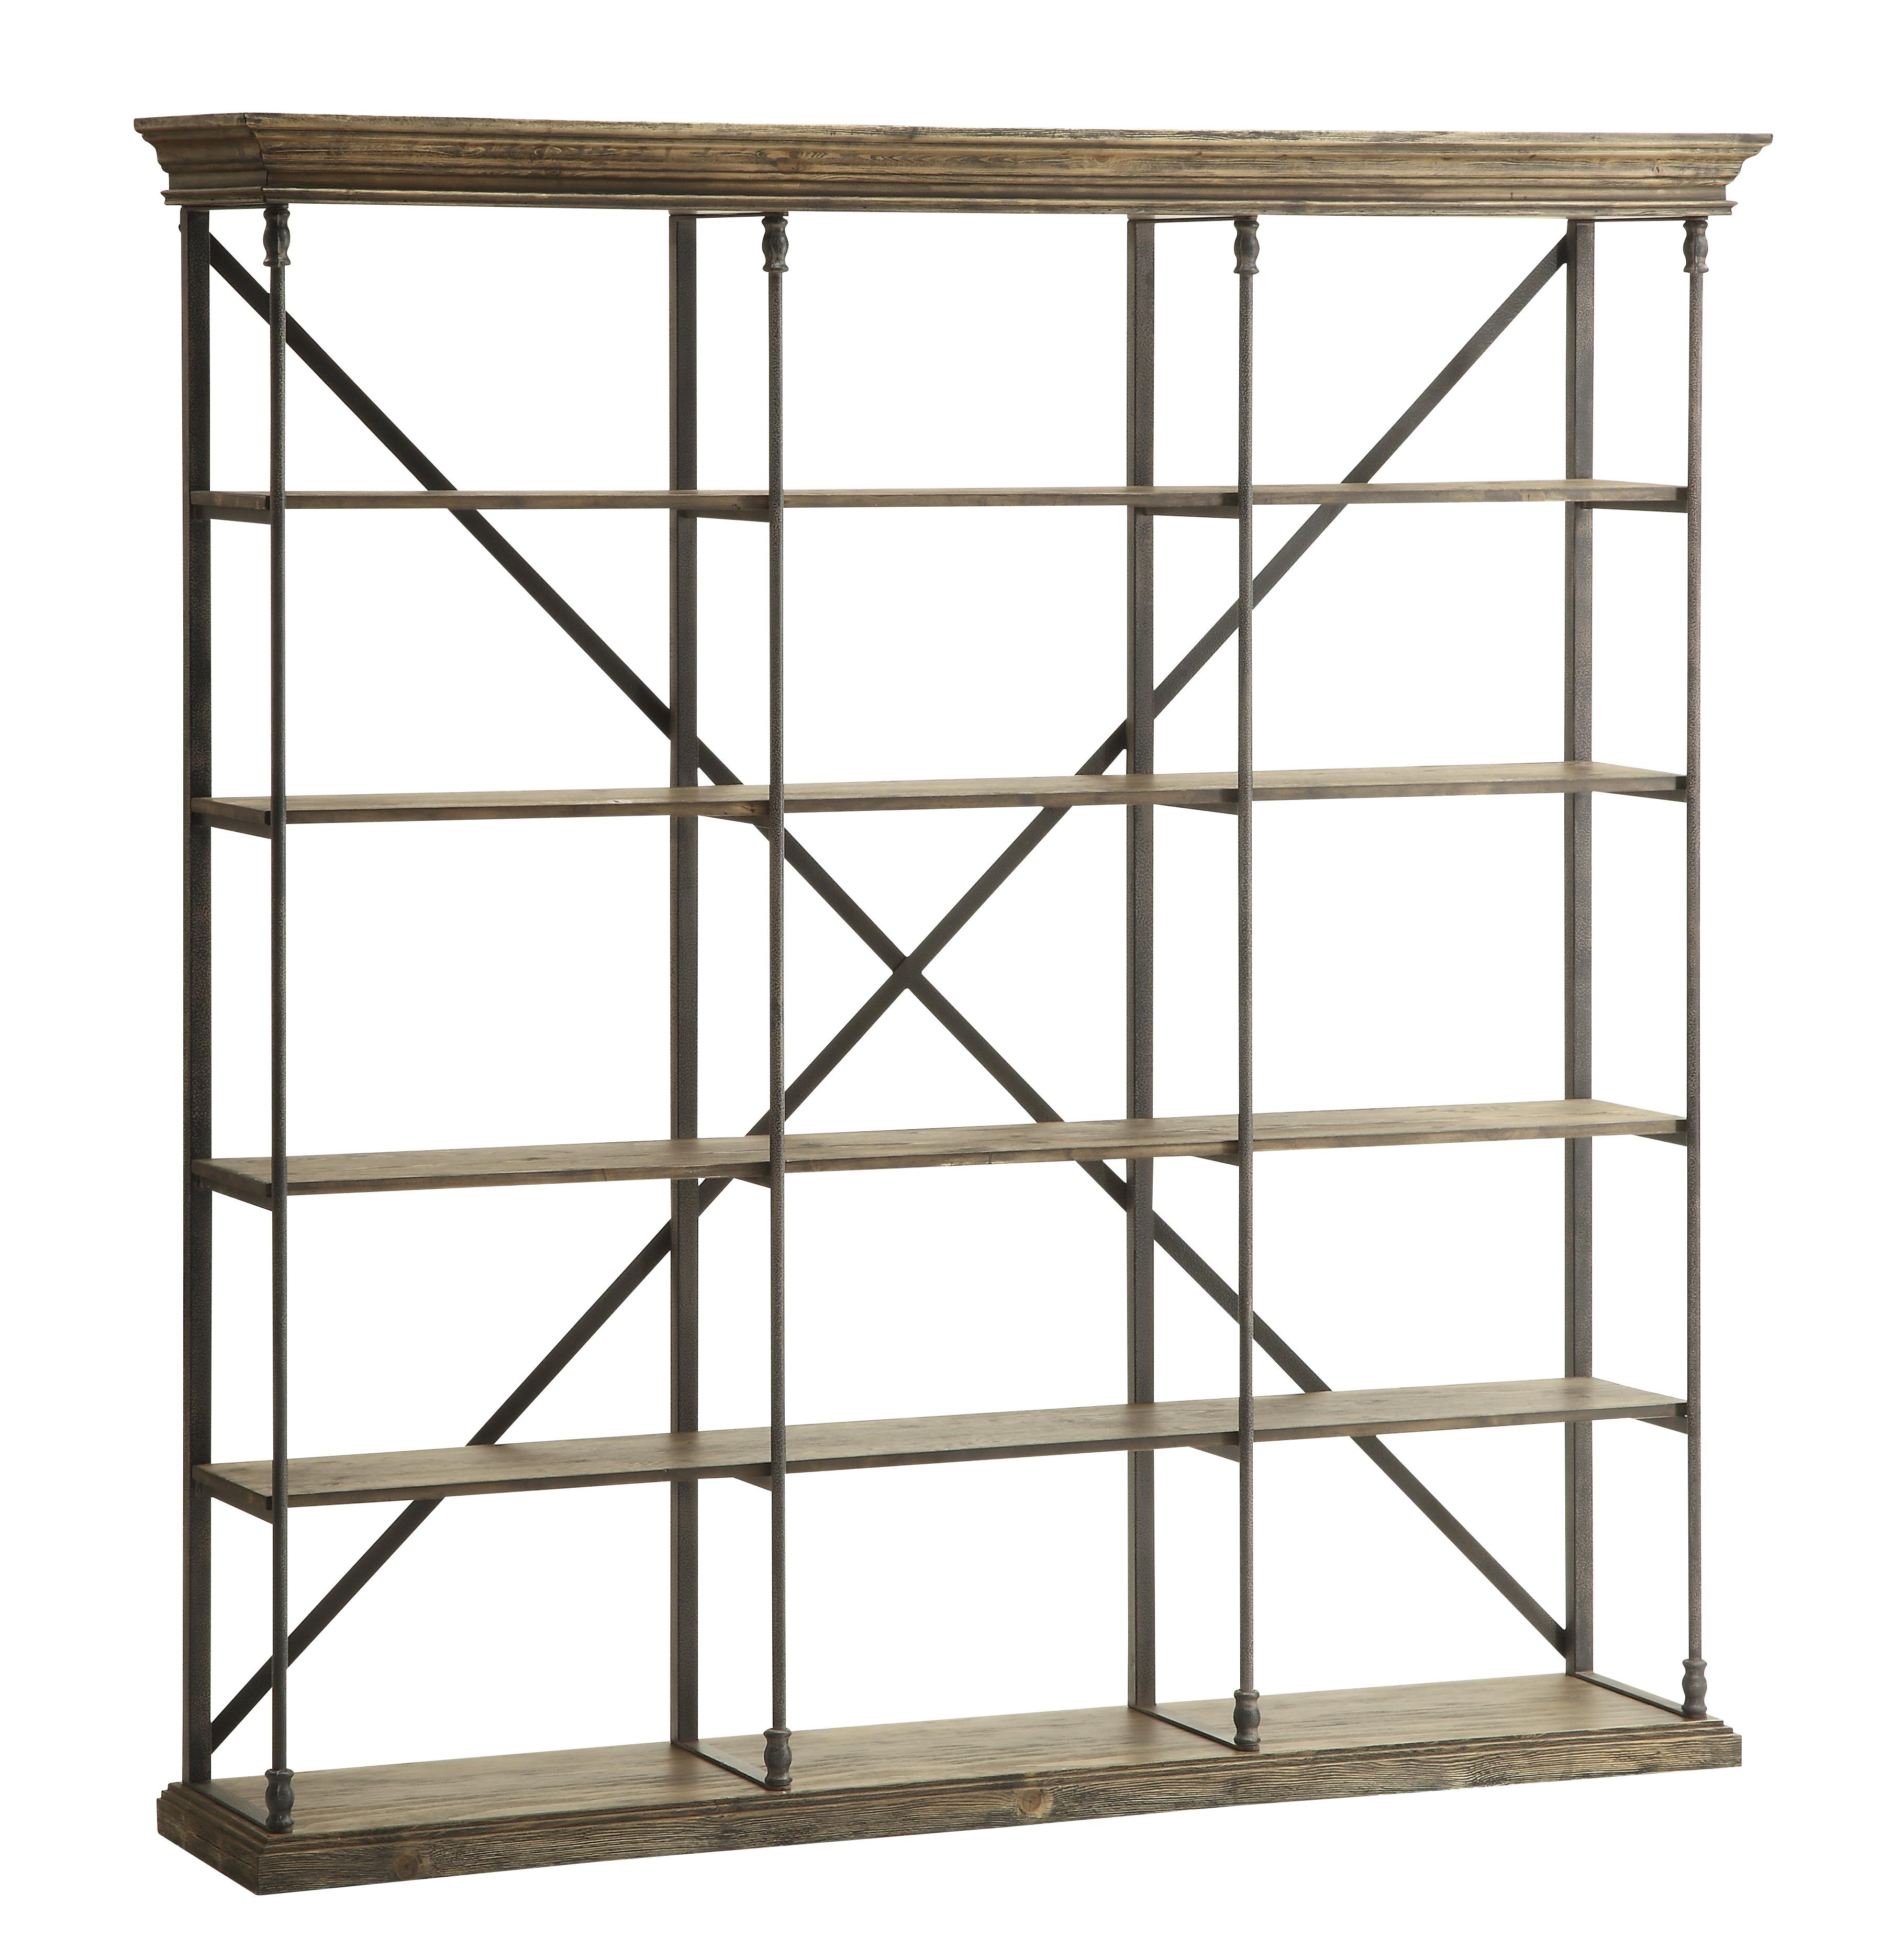 Coast to Coast Accents Large Bookcase by Coast to Coast Imports at Bullard Furniture